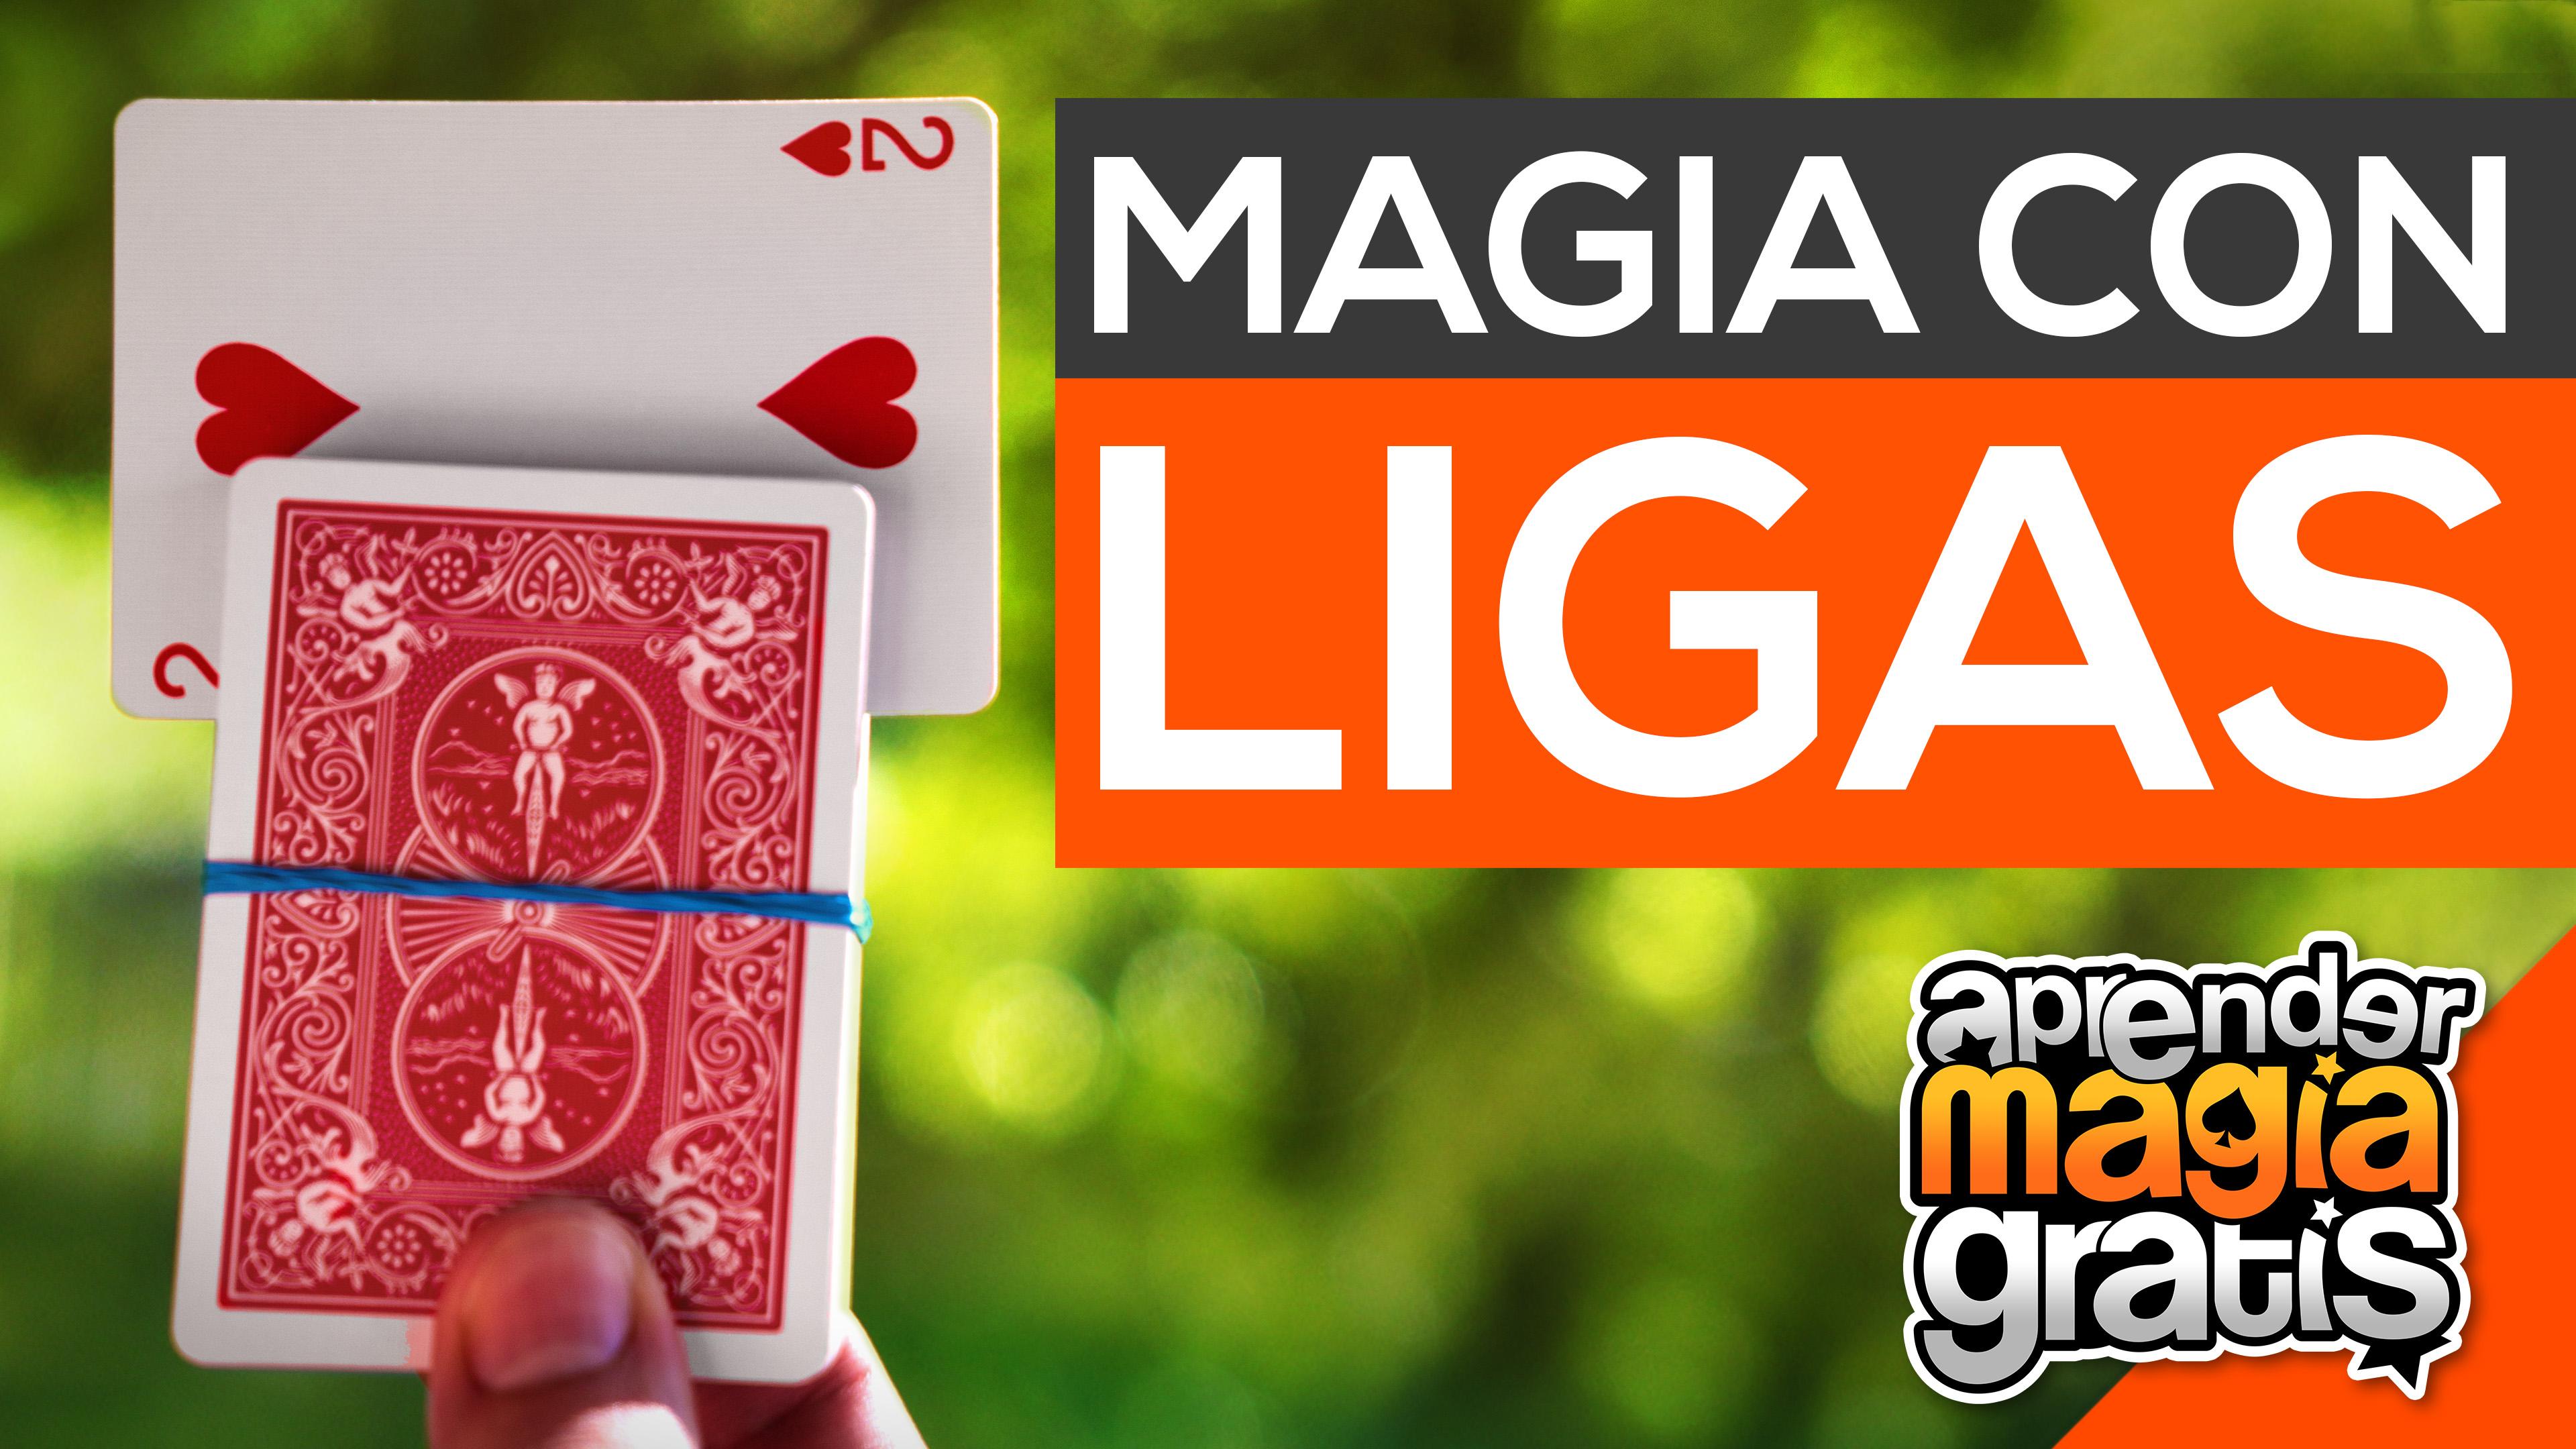 Trucos de magia revelado con ligas bandas elasticas o gomitas y cartas